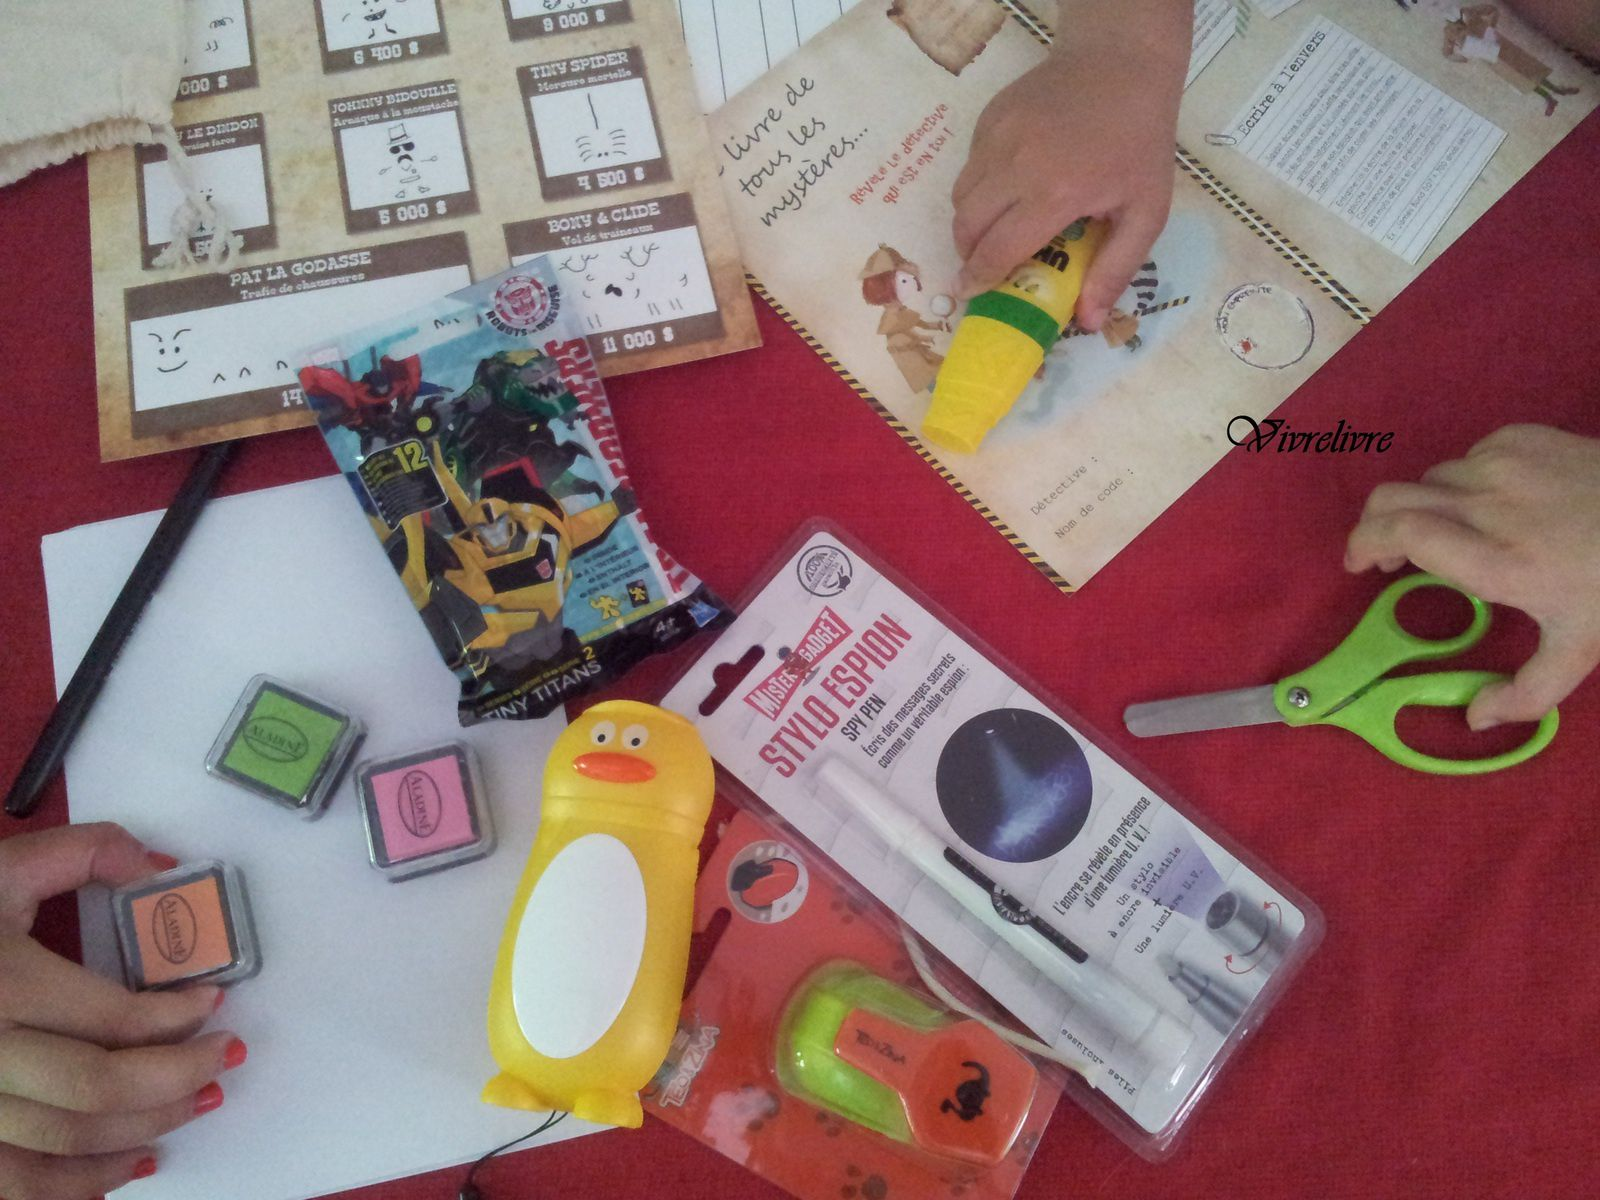 Jouer et découvrir# 19 - Box créative Gulli by Tiniloo.